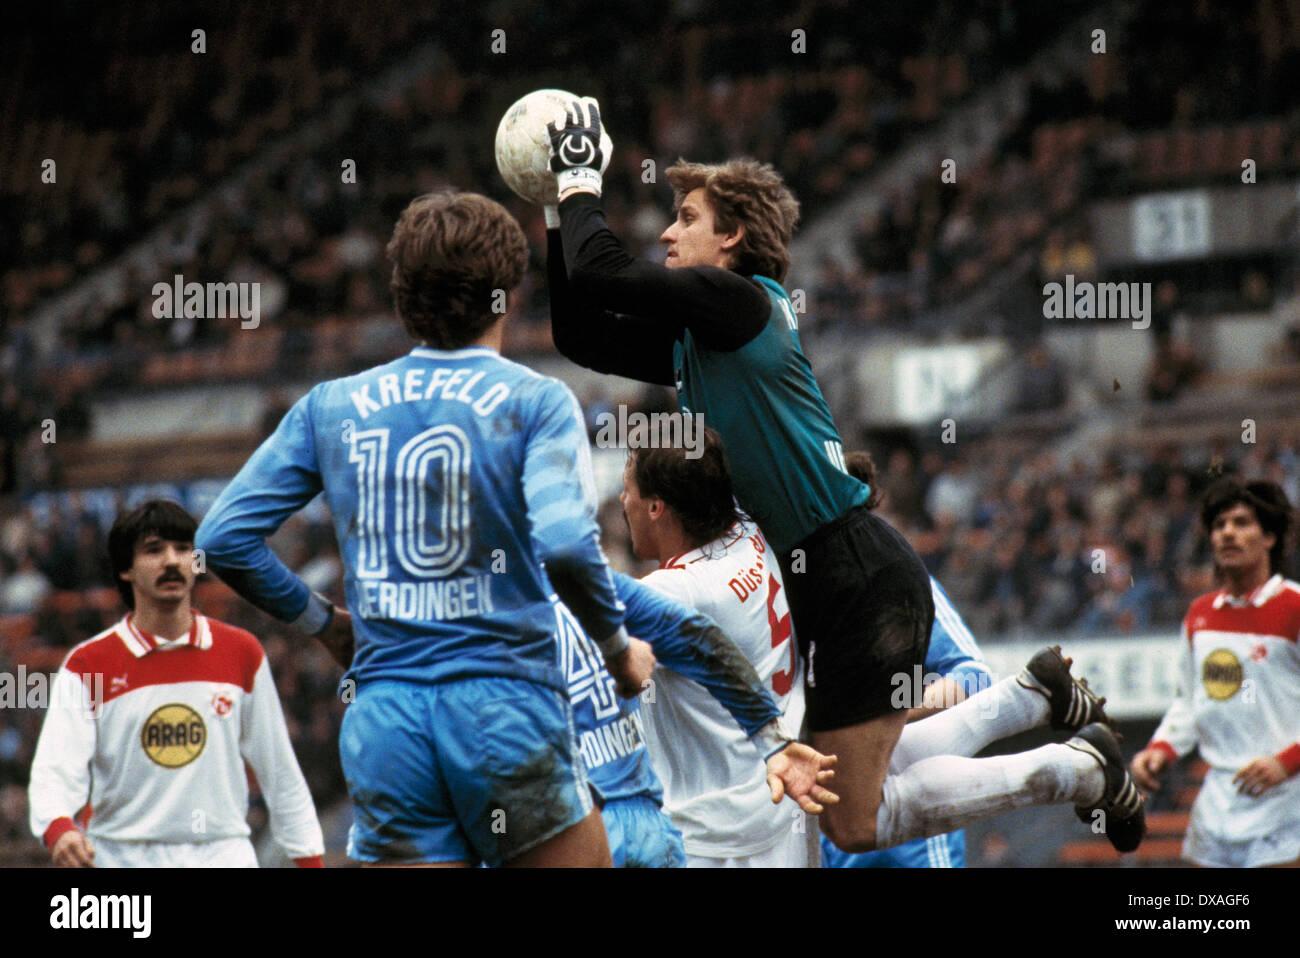 football, Bundesliga, 1984/1985, Rhine Stadium, Fortuna Duesseldorf versus FC Bayer 05 Uerdingen 2:2, scene of the match, save of keeper Werner Vollack (Bayer) - Stock Image